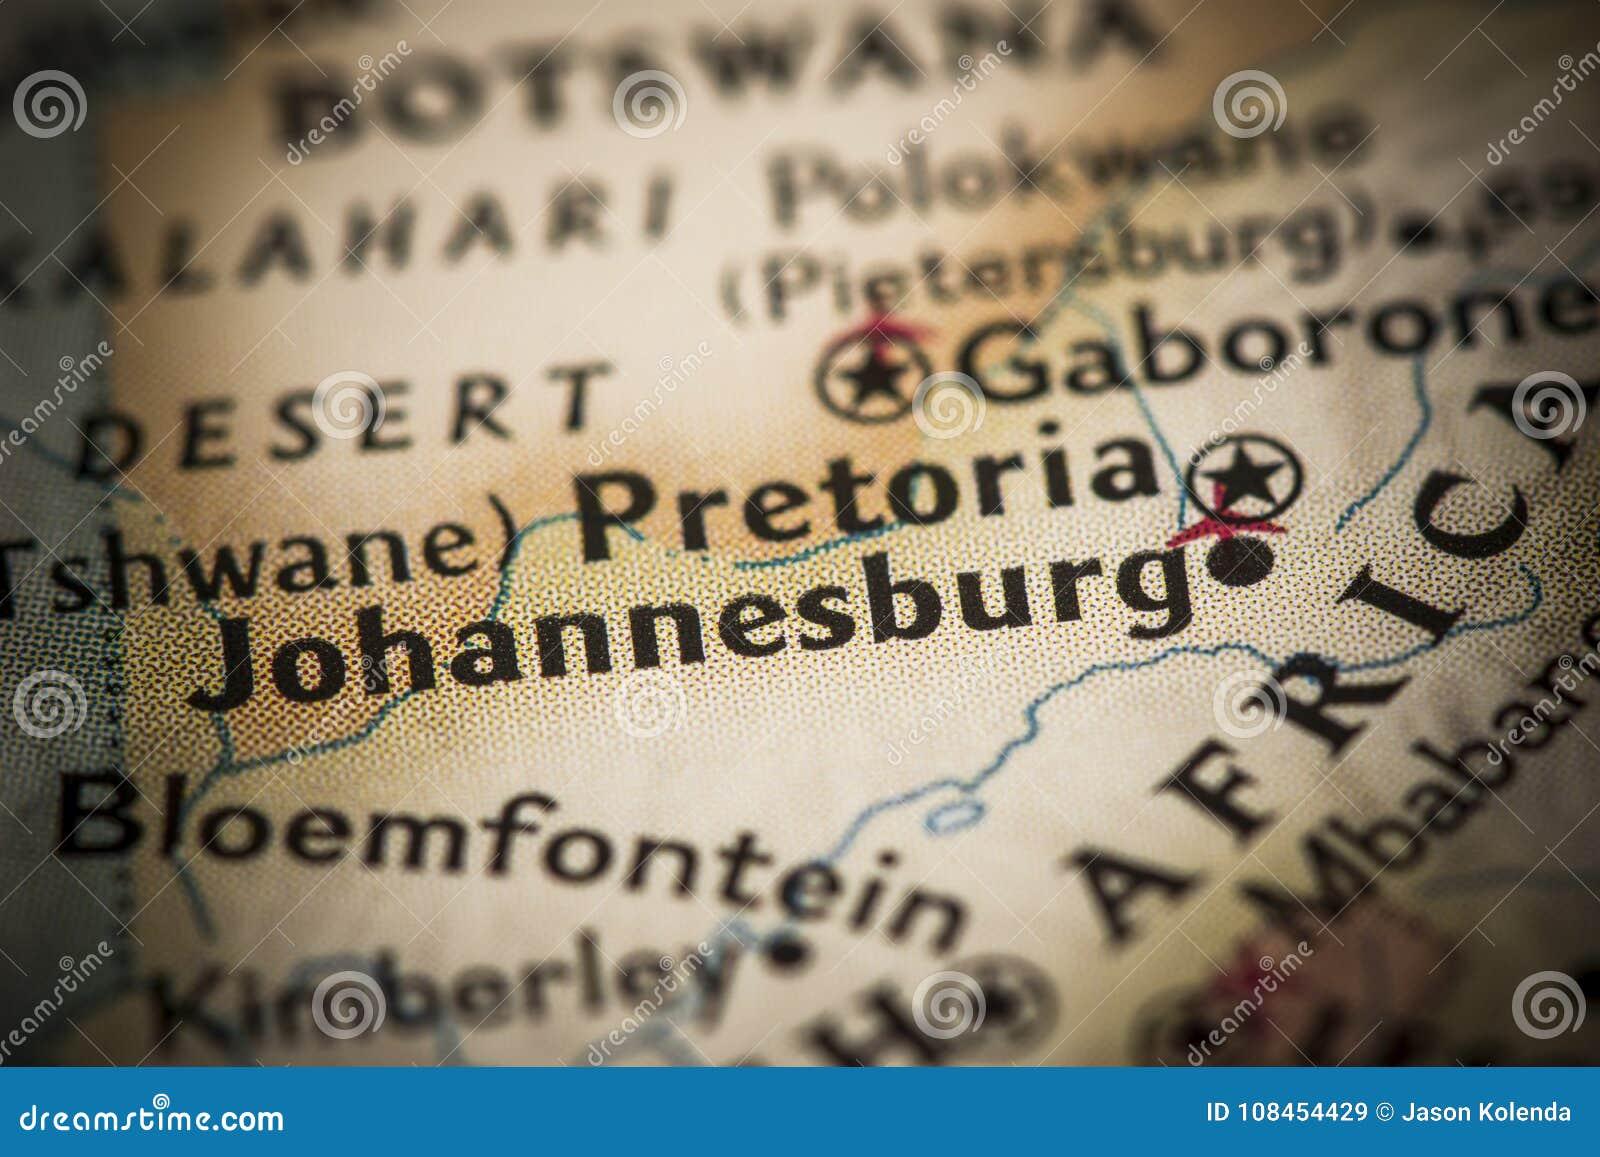 Johannesburgo en mapa